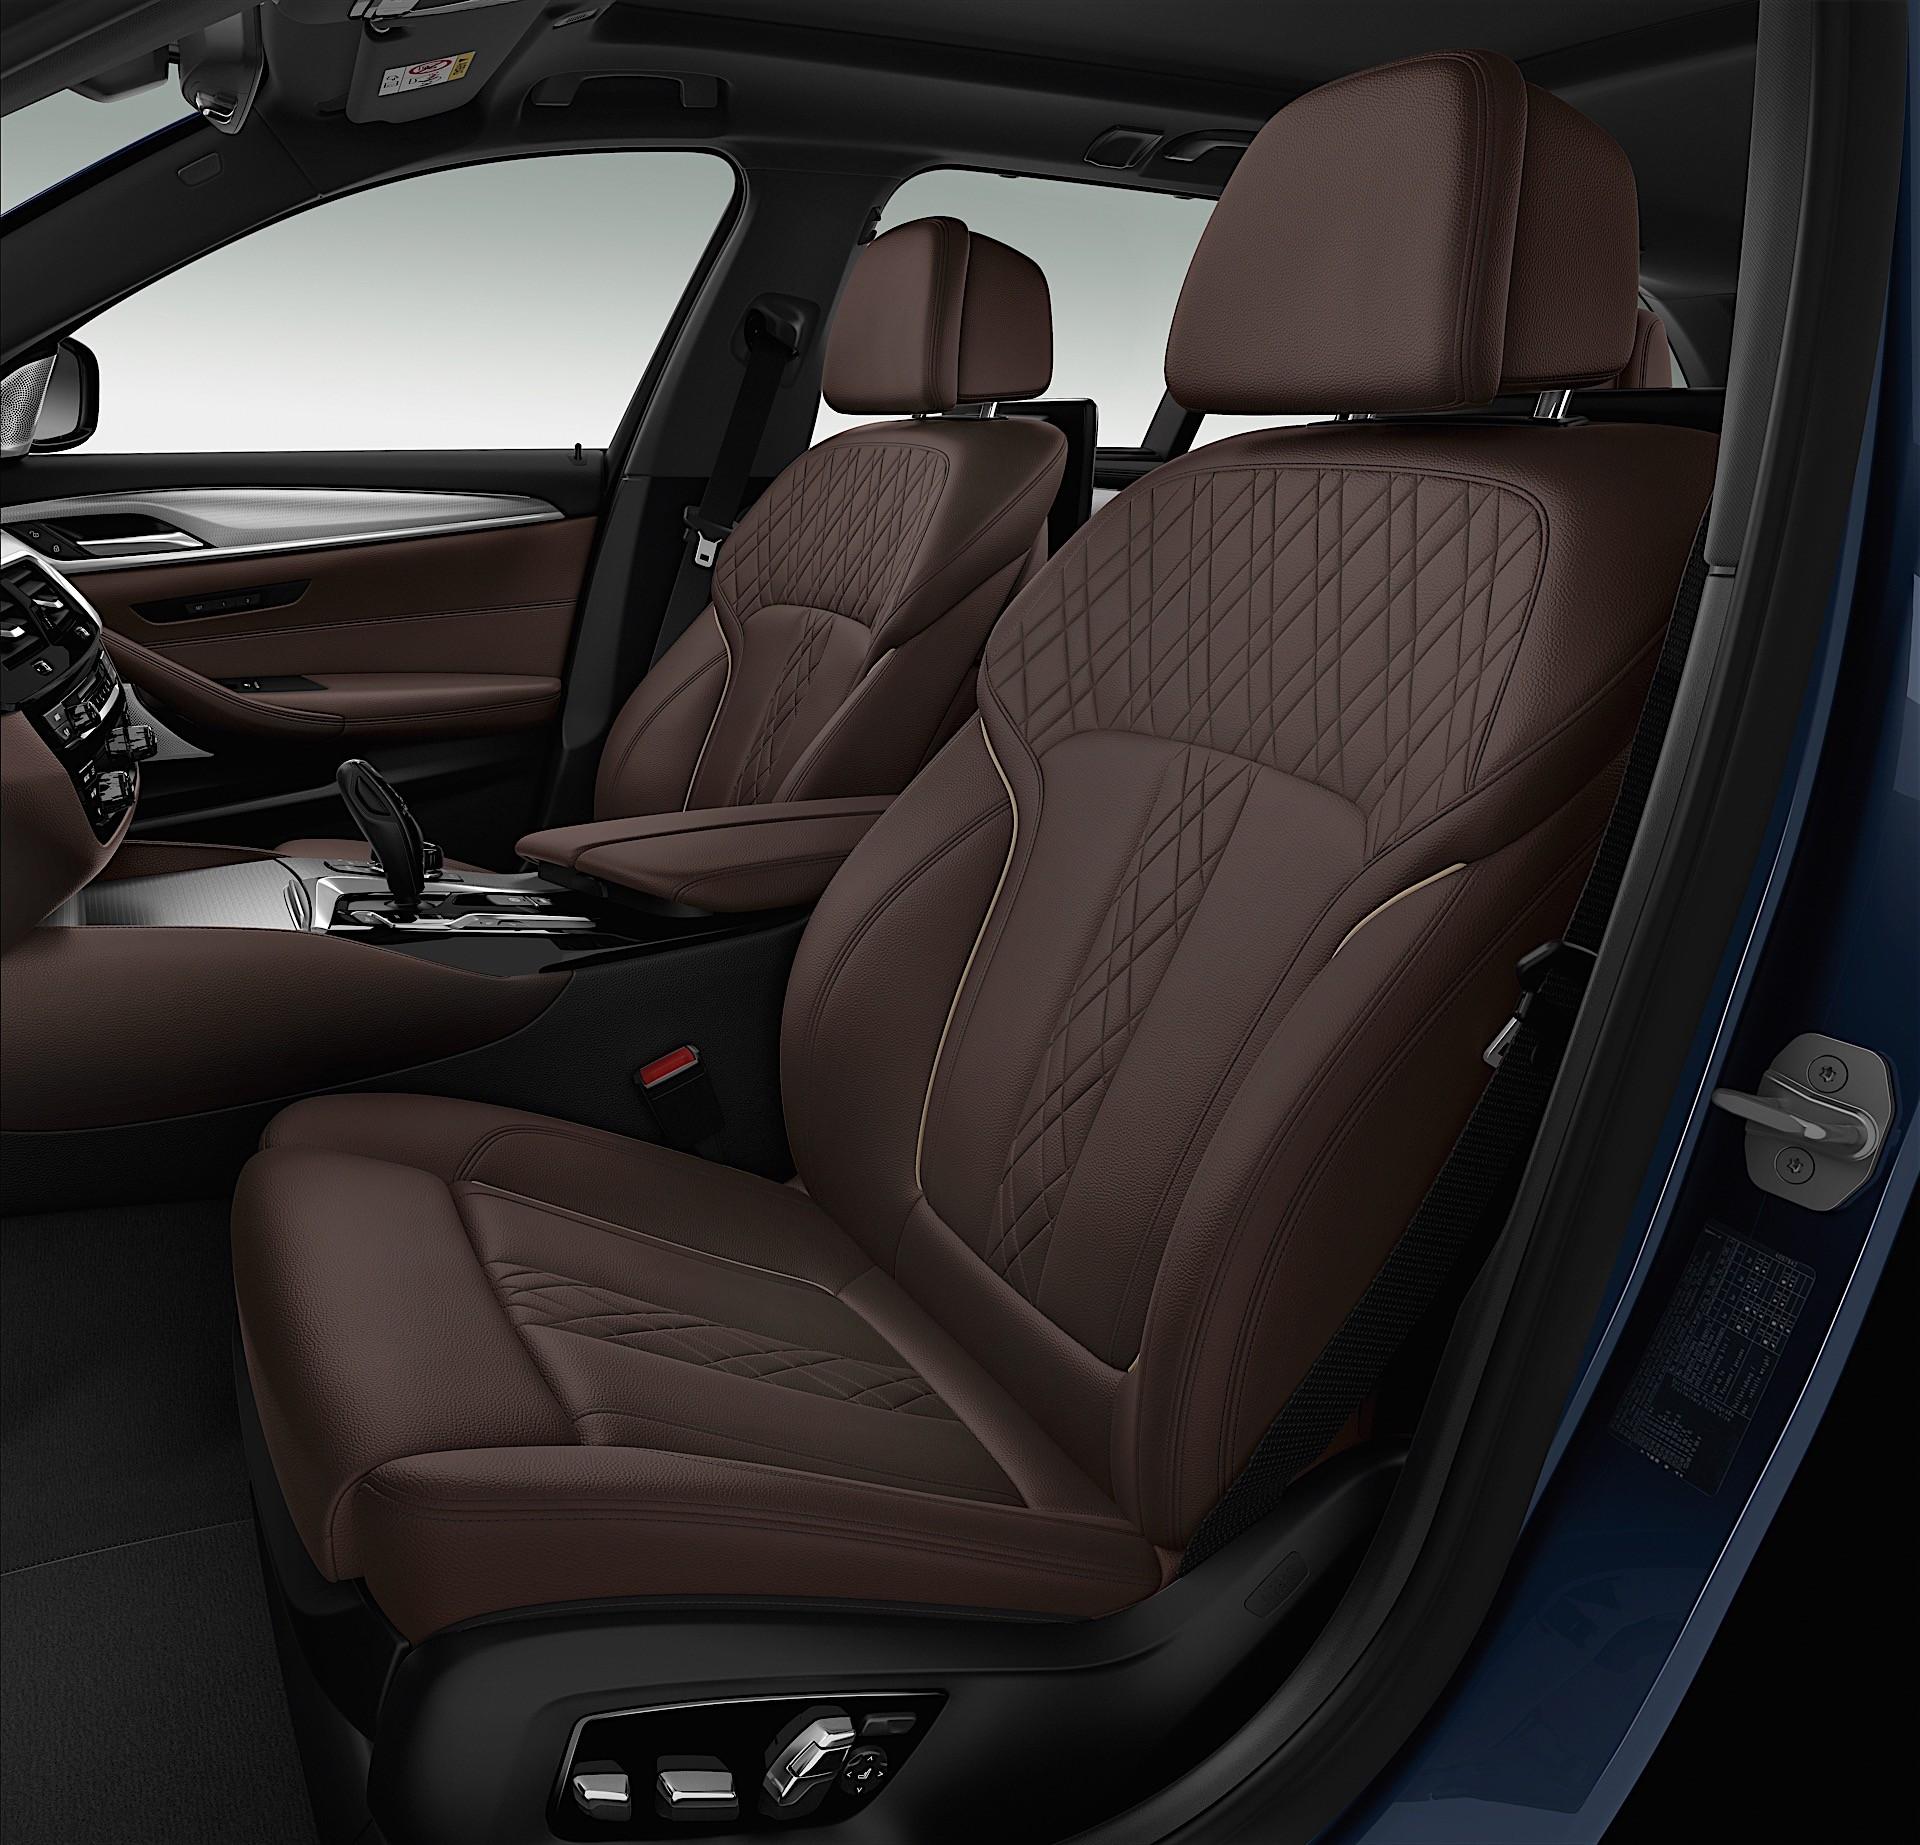 2018 bmw m550d xdrive g30 is a fast quad turbo diesel in. Black Bedroom Furniture Sets. Home Design Ideas